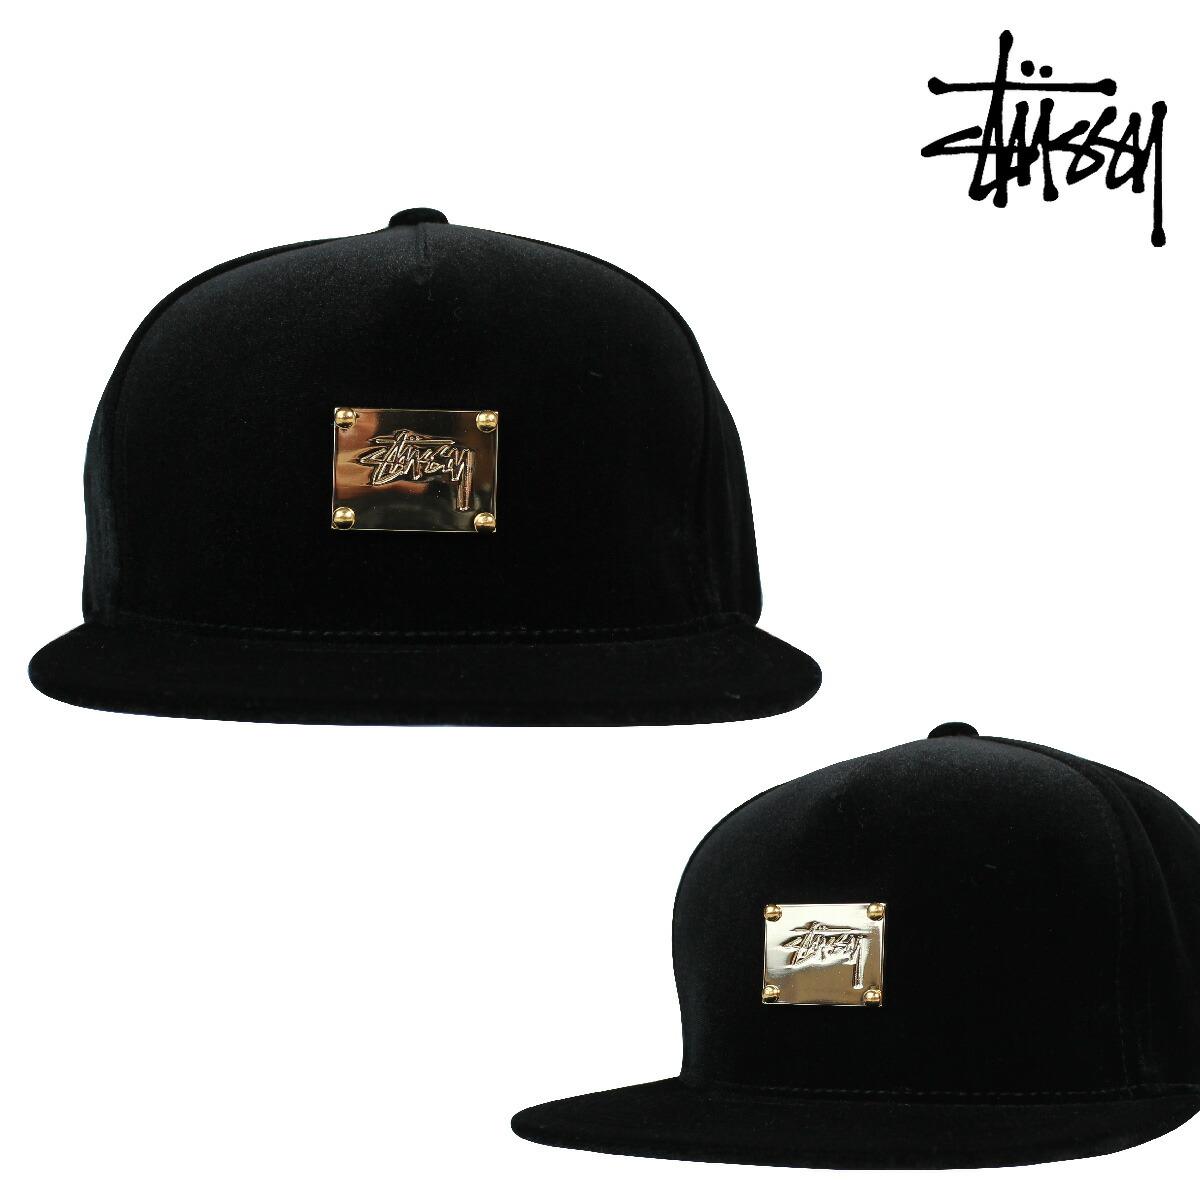 0401fdf9e4f stussy shop thailand